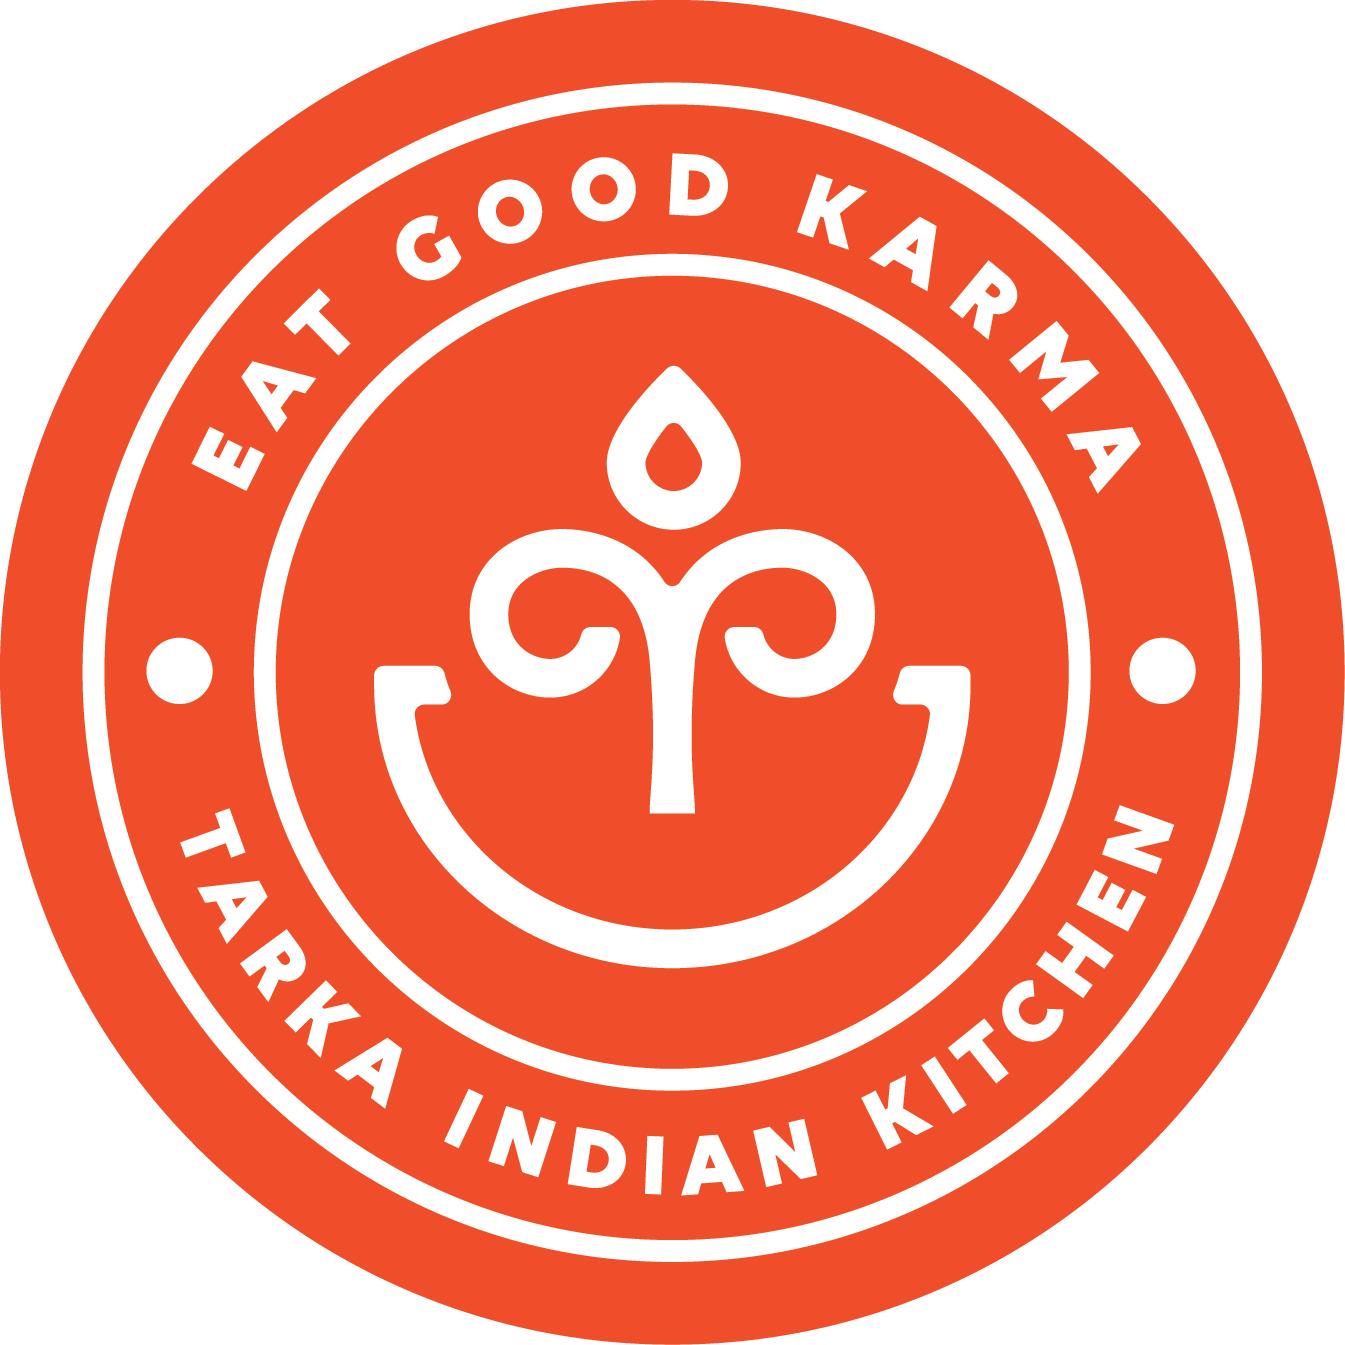 Tarka Indian Kitchen - The Domain Logo